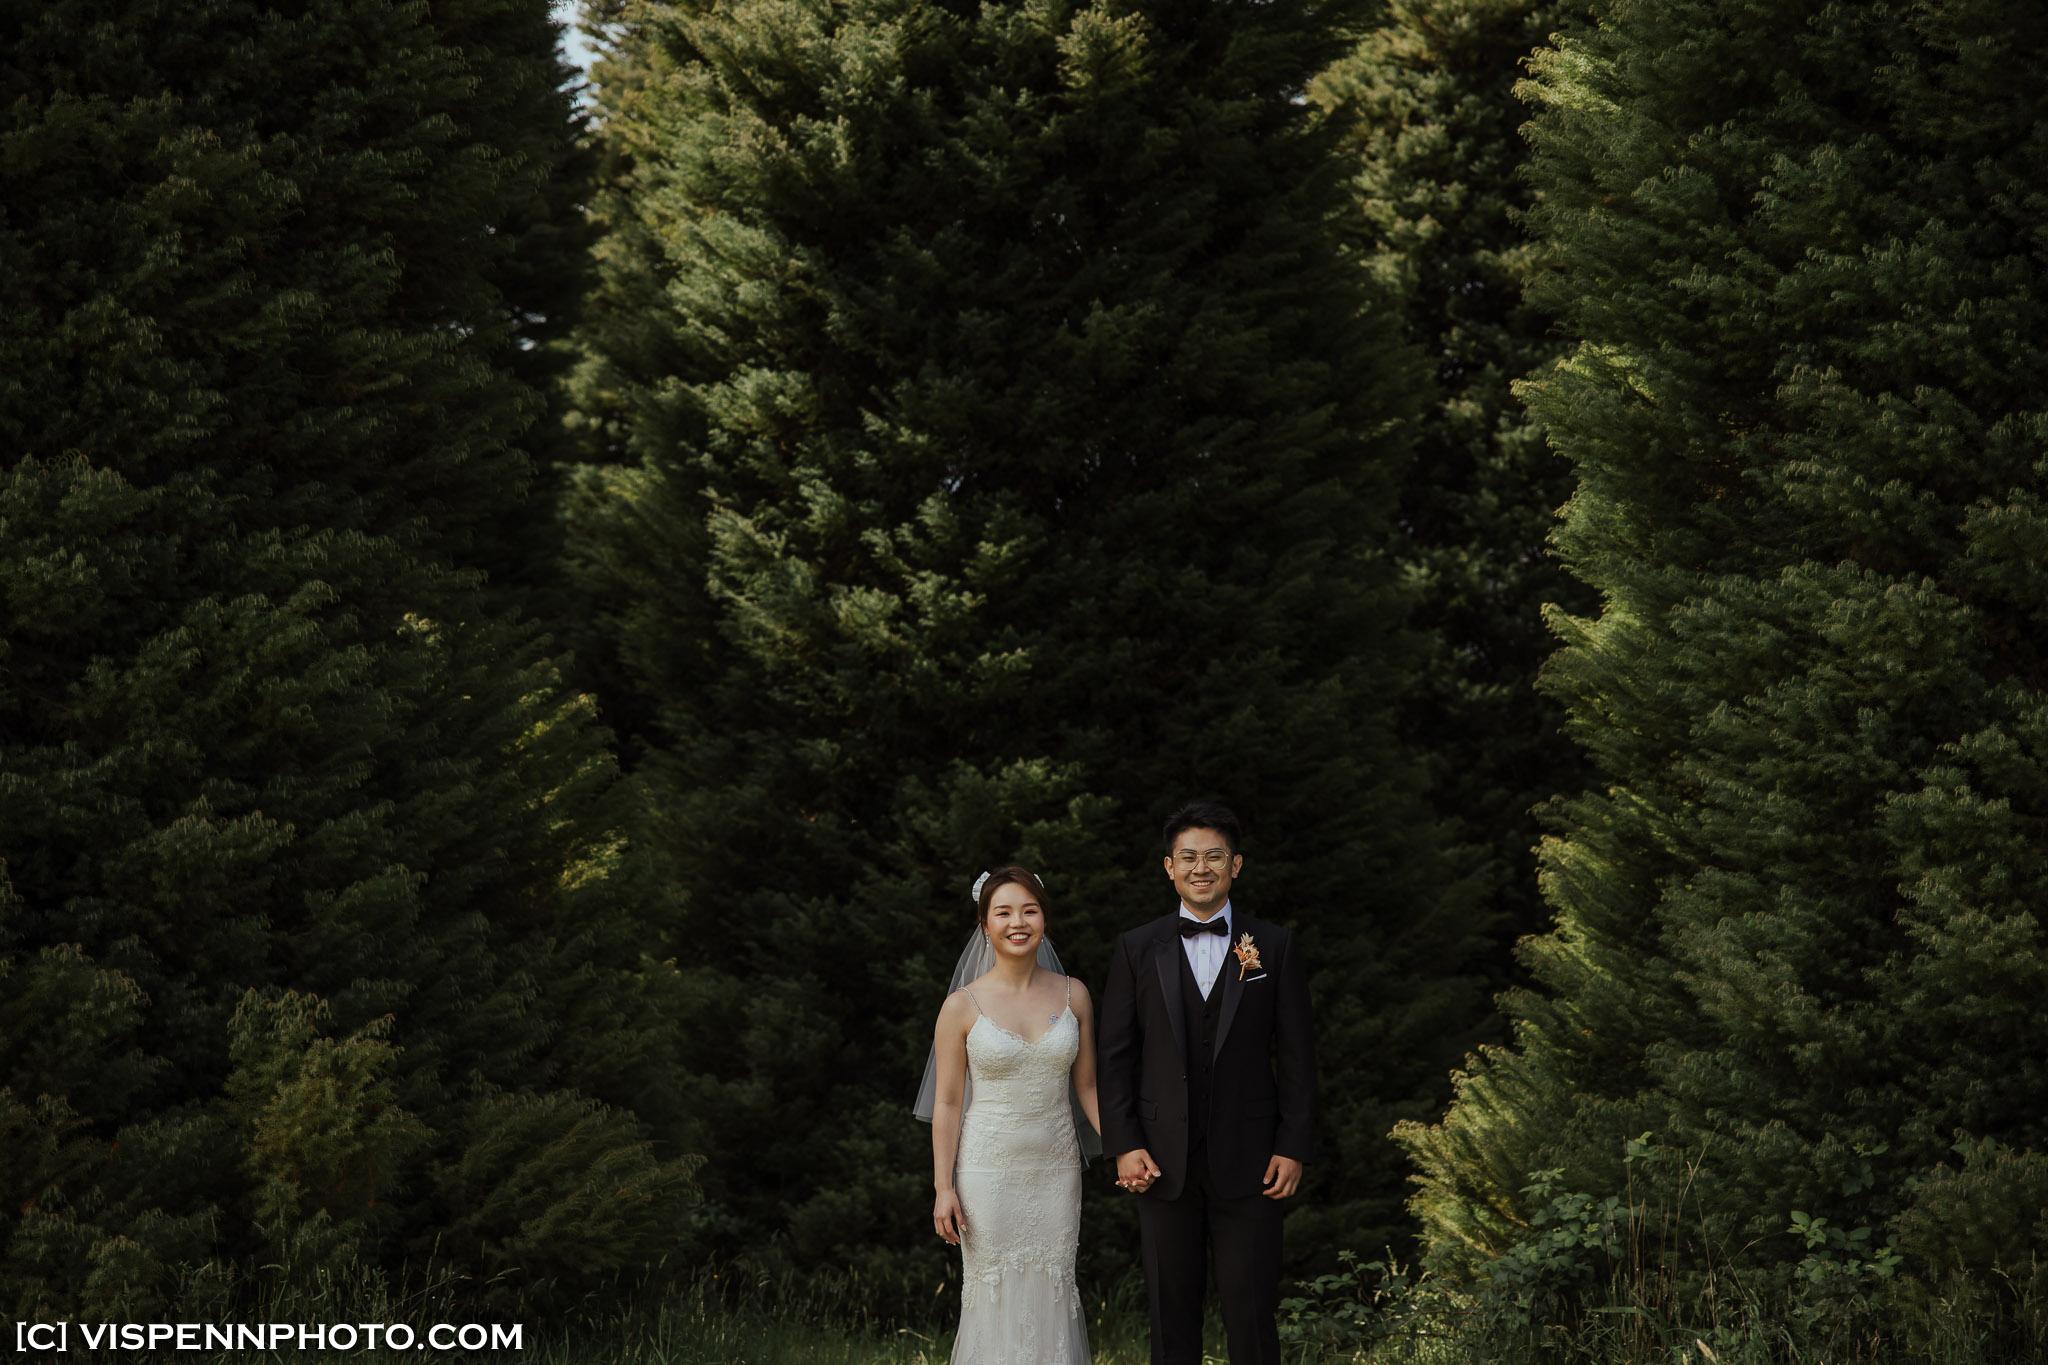 WEDDING DAY Photography Melbourne ElitaPB 06722 1P EOSR ZHPENN